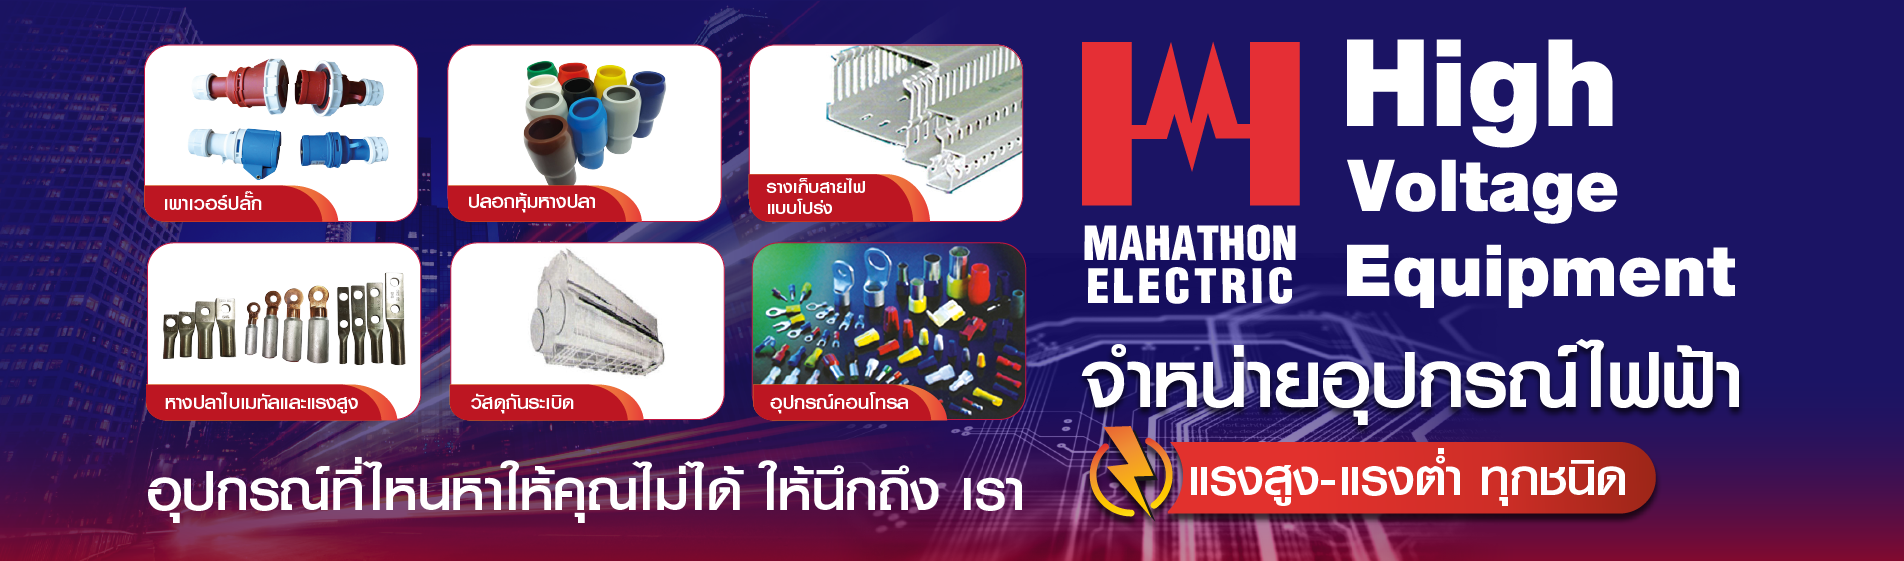 https://www.mahathonelectric.com